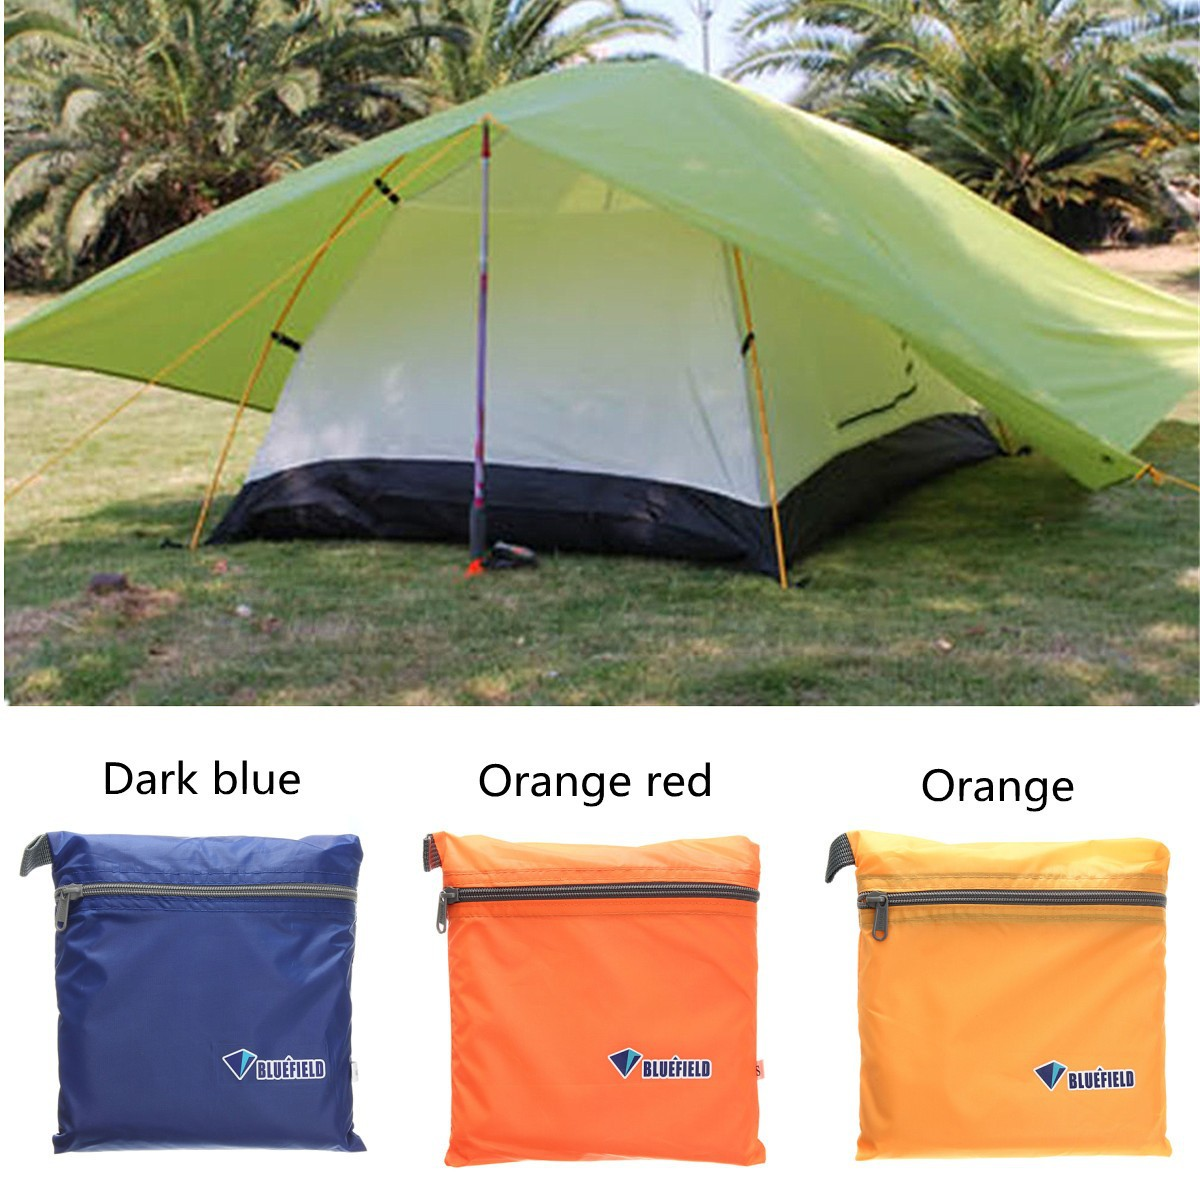 Waterproof Portable Awnings : Outdoor portable camping hiking tent sunshade waterproof